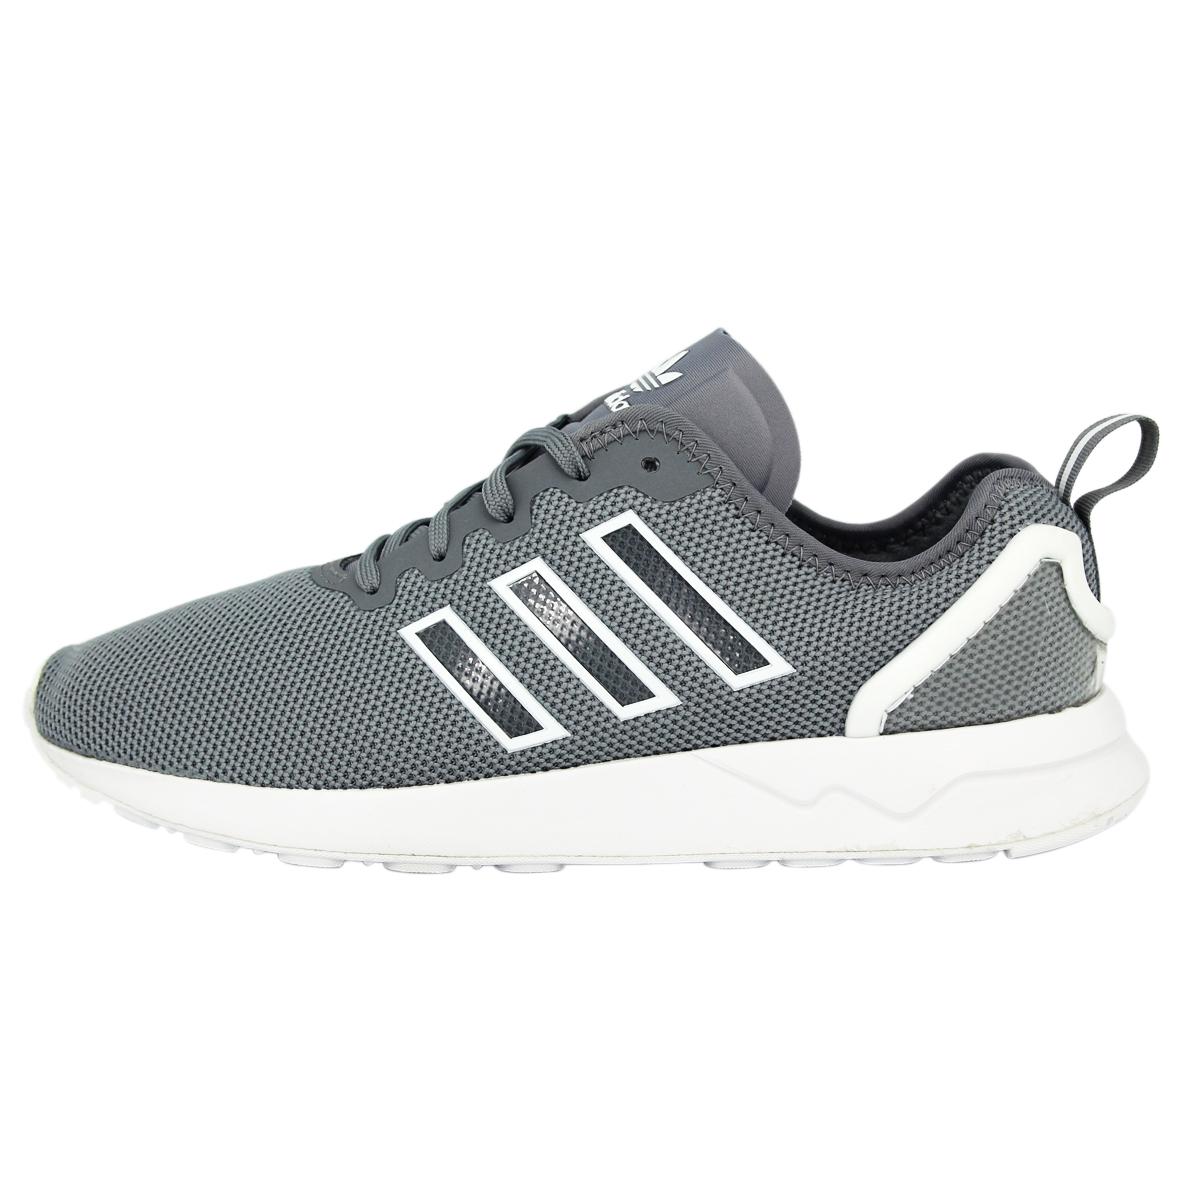 check out 93a89 73af7 Details about Adidas Originals ZX FLUX ADV Grey Men Sneakers Shoes